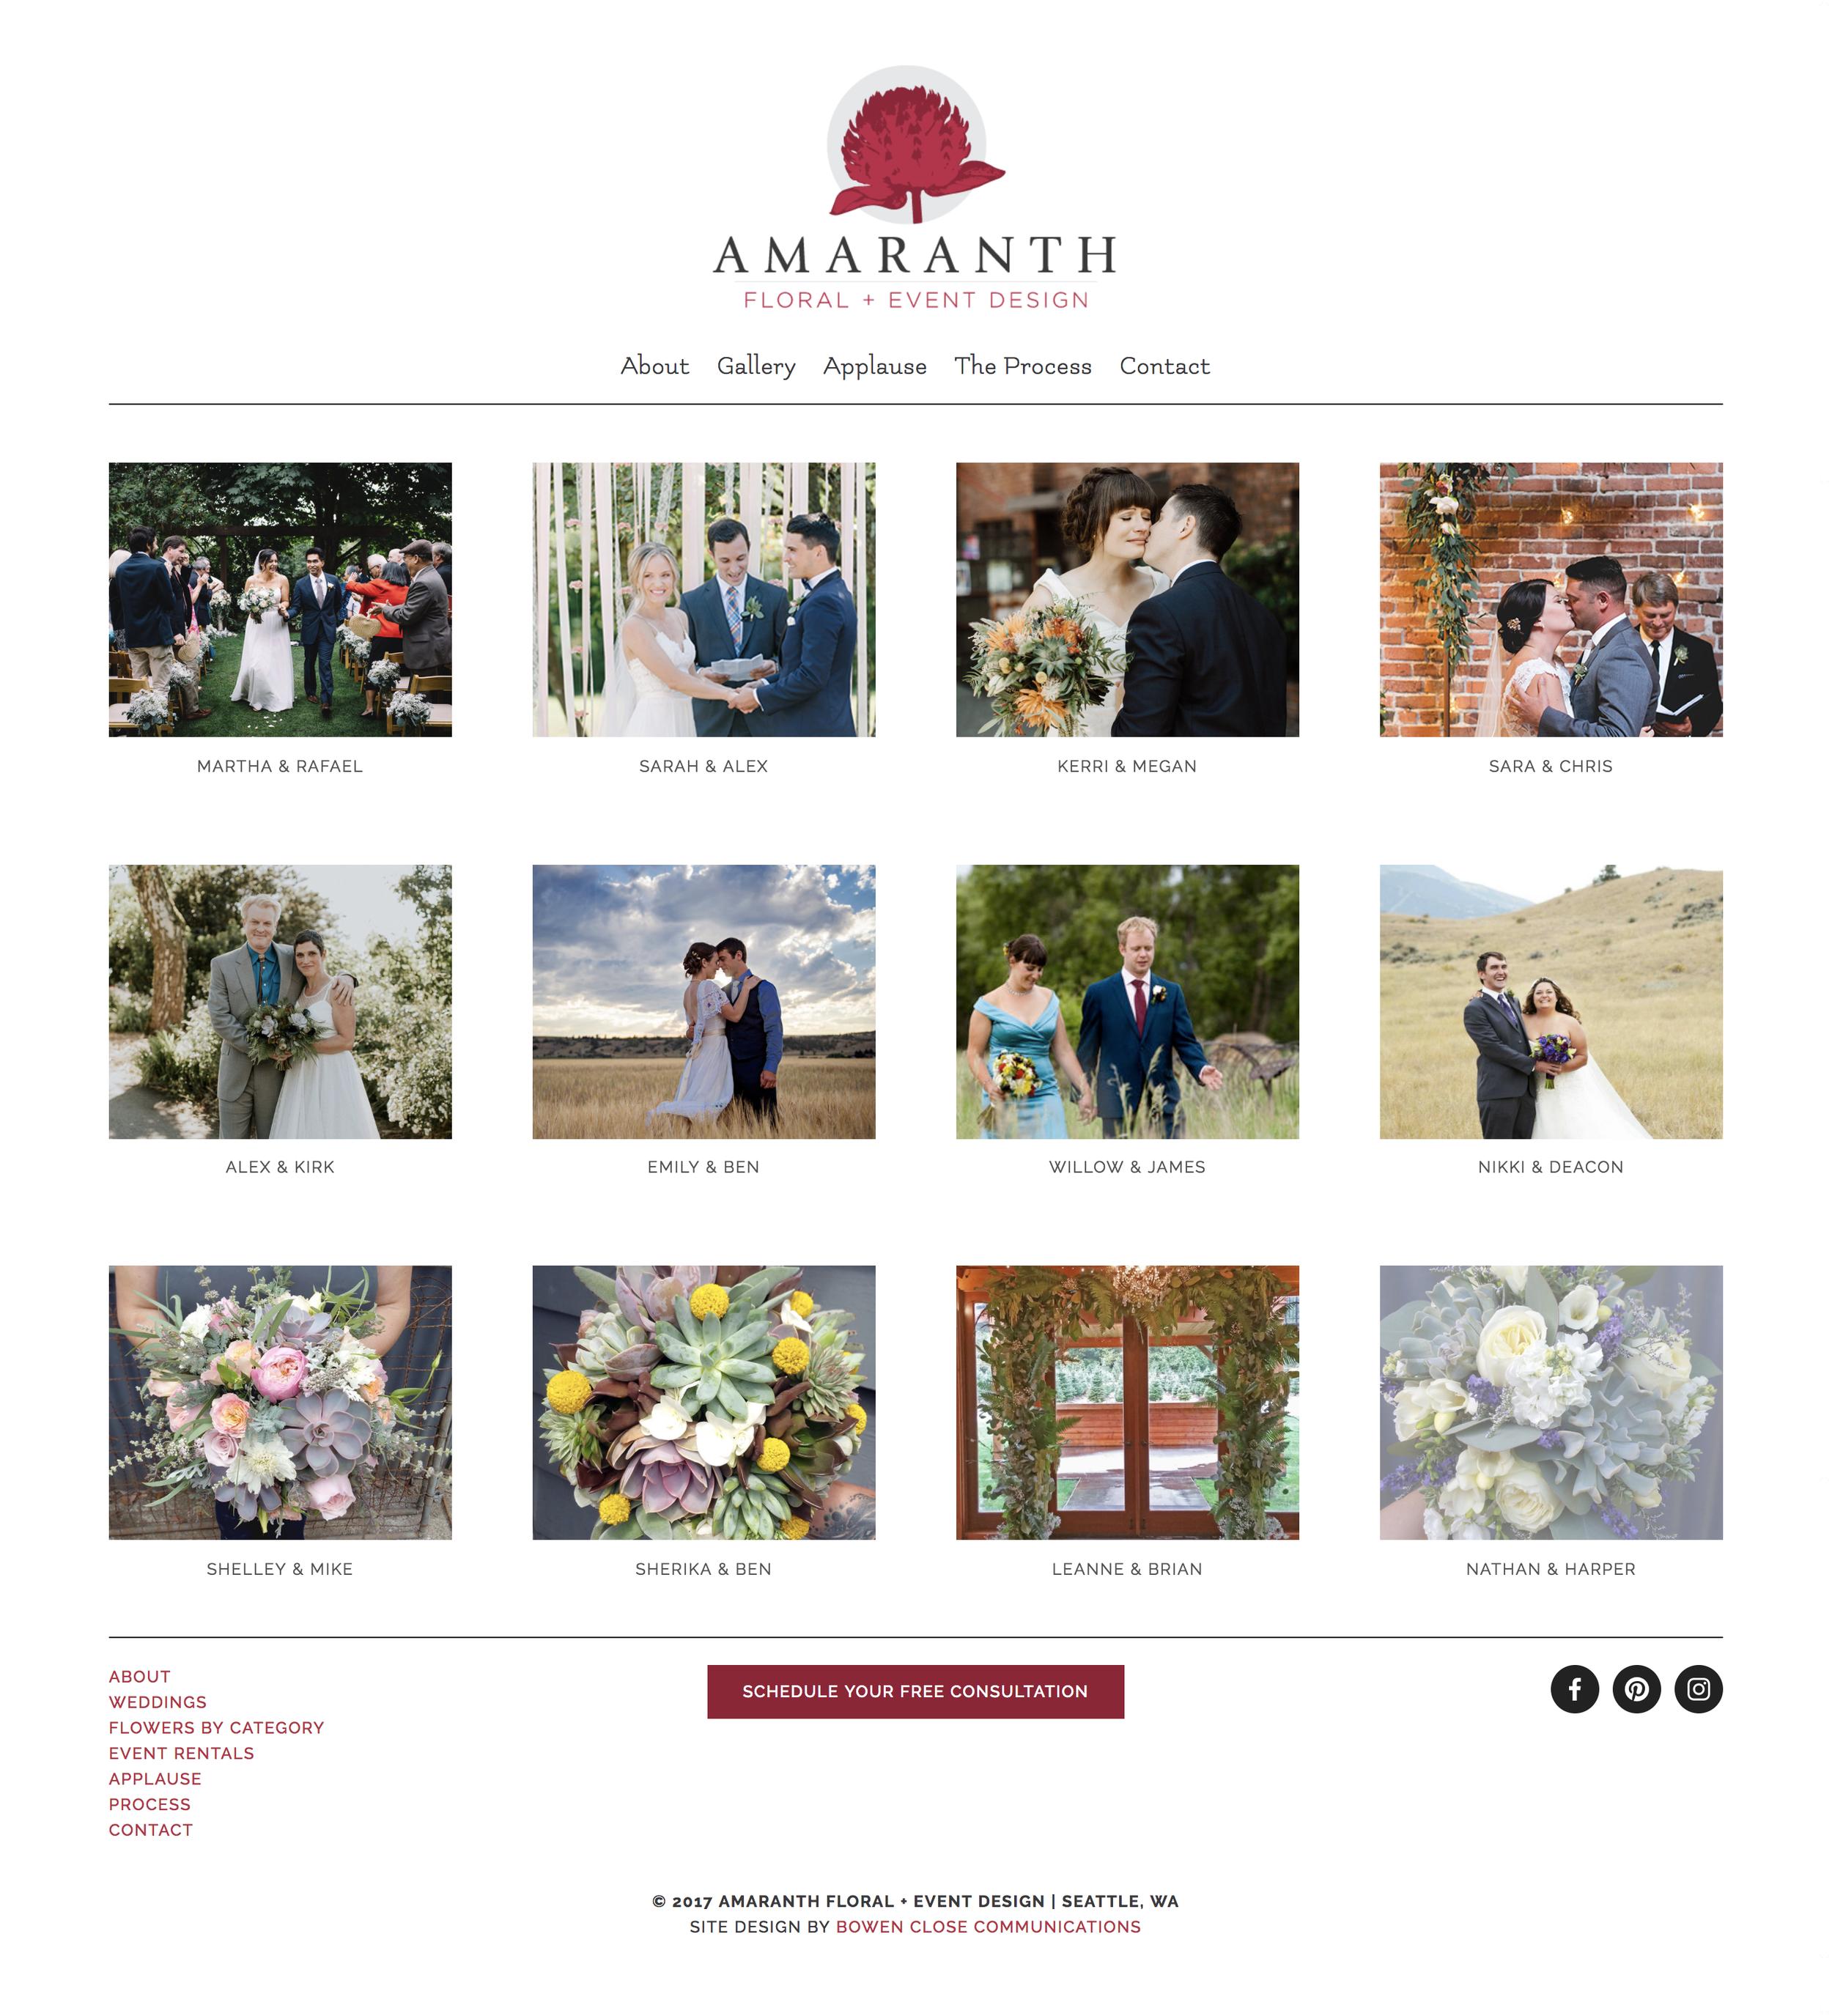 Amaranth - Weddings page.png